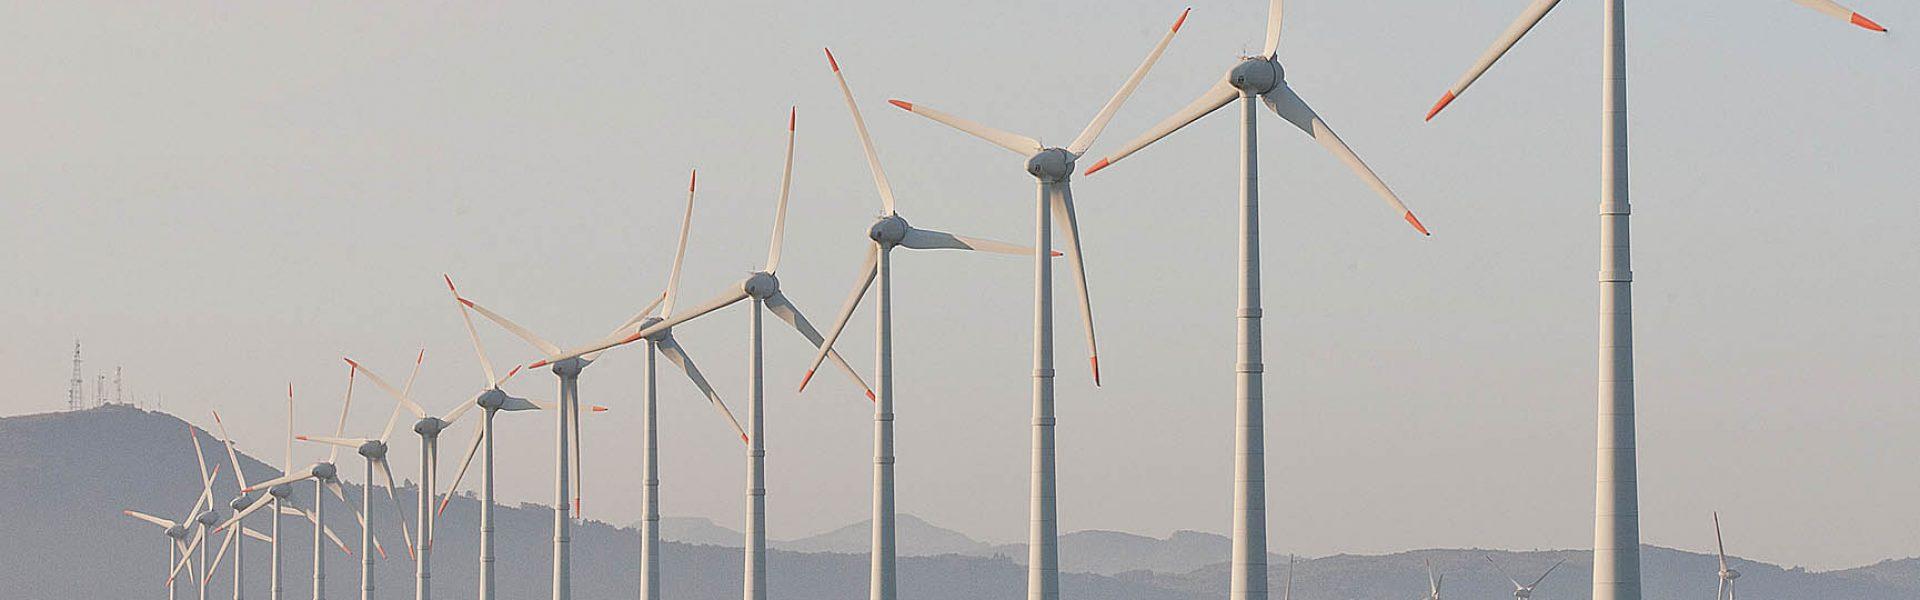 PORTO ALEGRE, RS, BRASIL, 22.08.12: Parque eólico de Osório. Foto: Claudio Fachel/Palácio Piratini